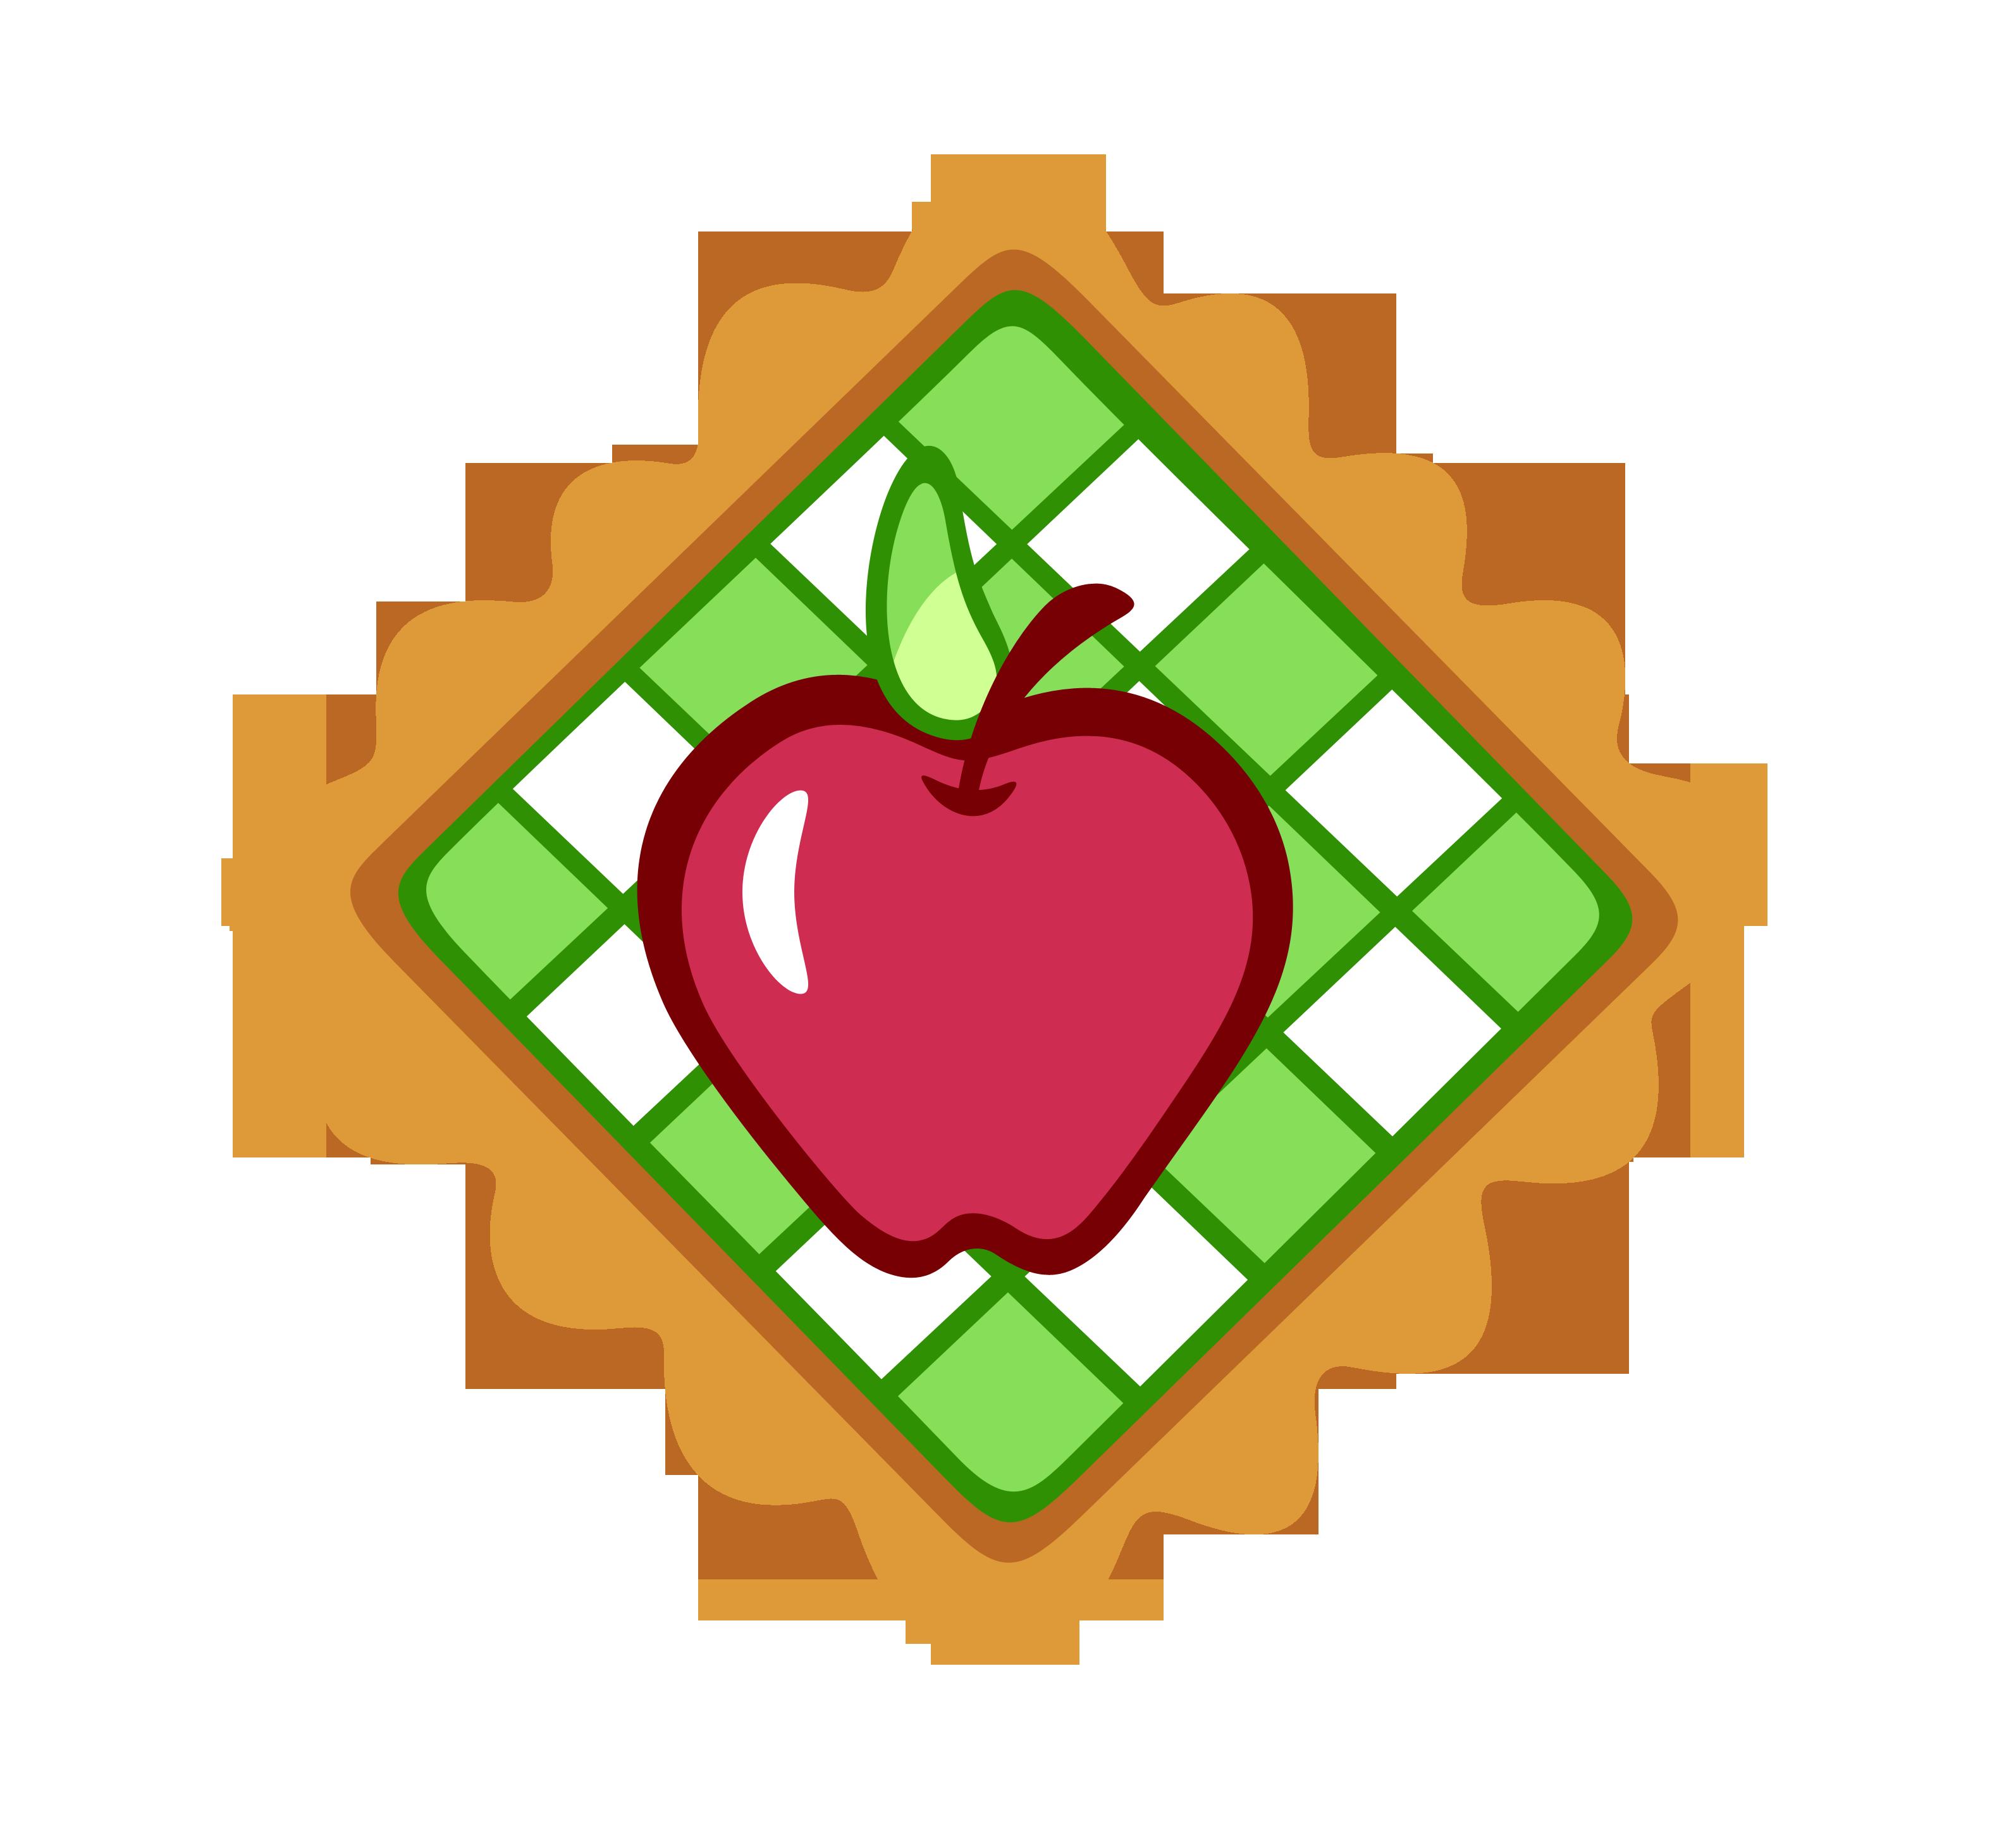 Death star shaped as an apple clipart graphic transparent Cutie Mark - Apple Honey by Durpy on DeviantArt | mlp | Pinterest ... graphic transparent